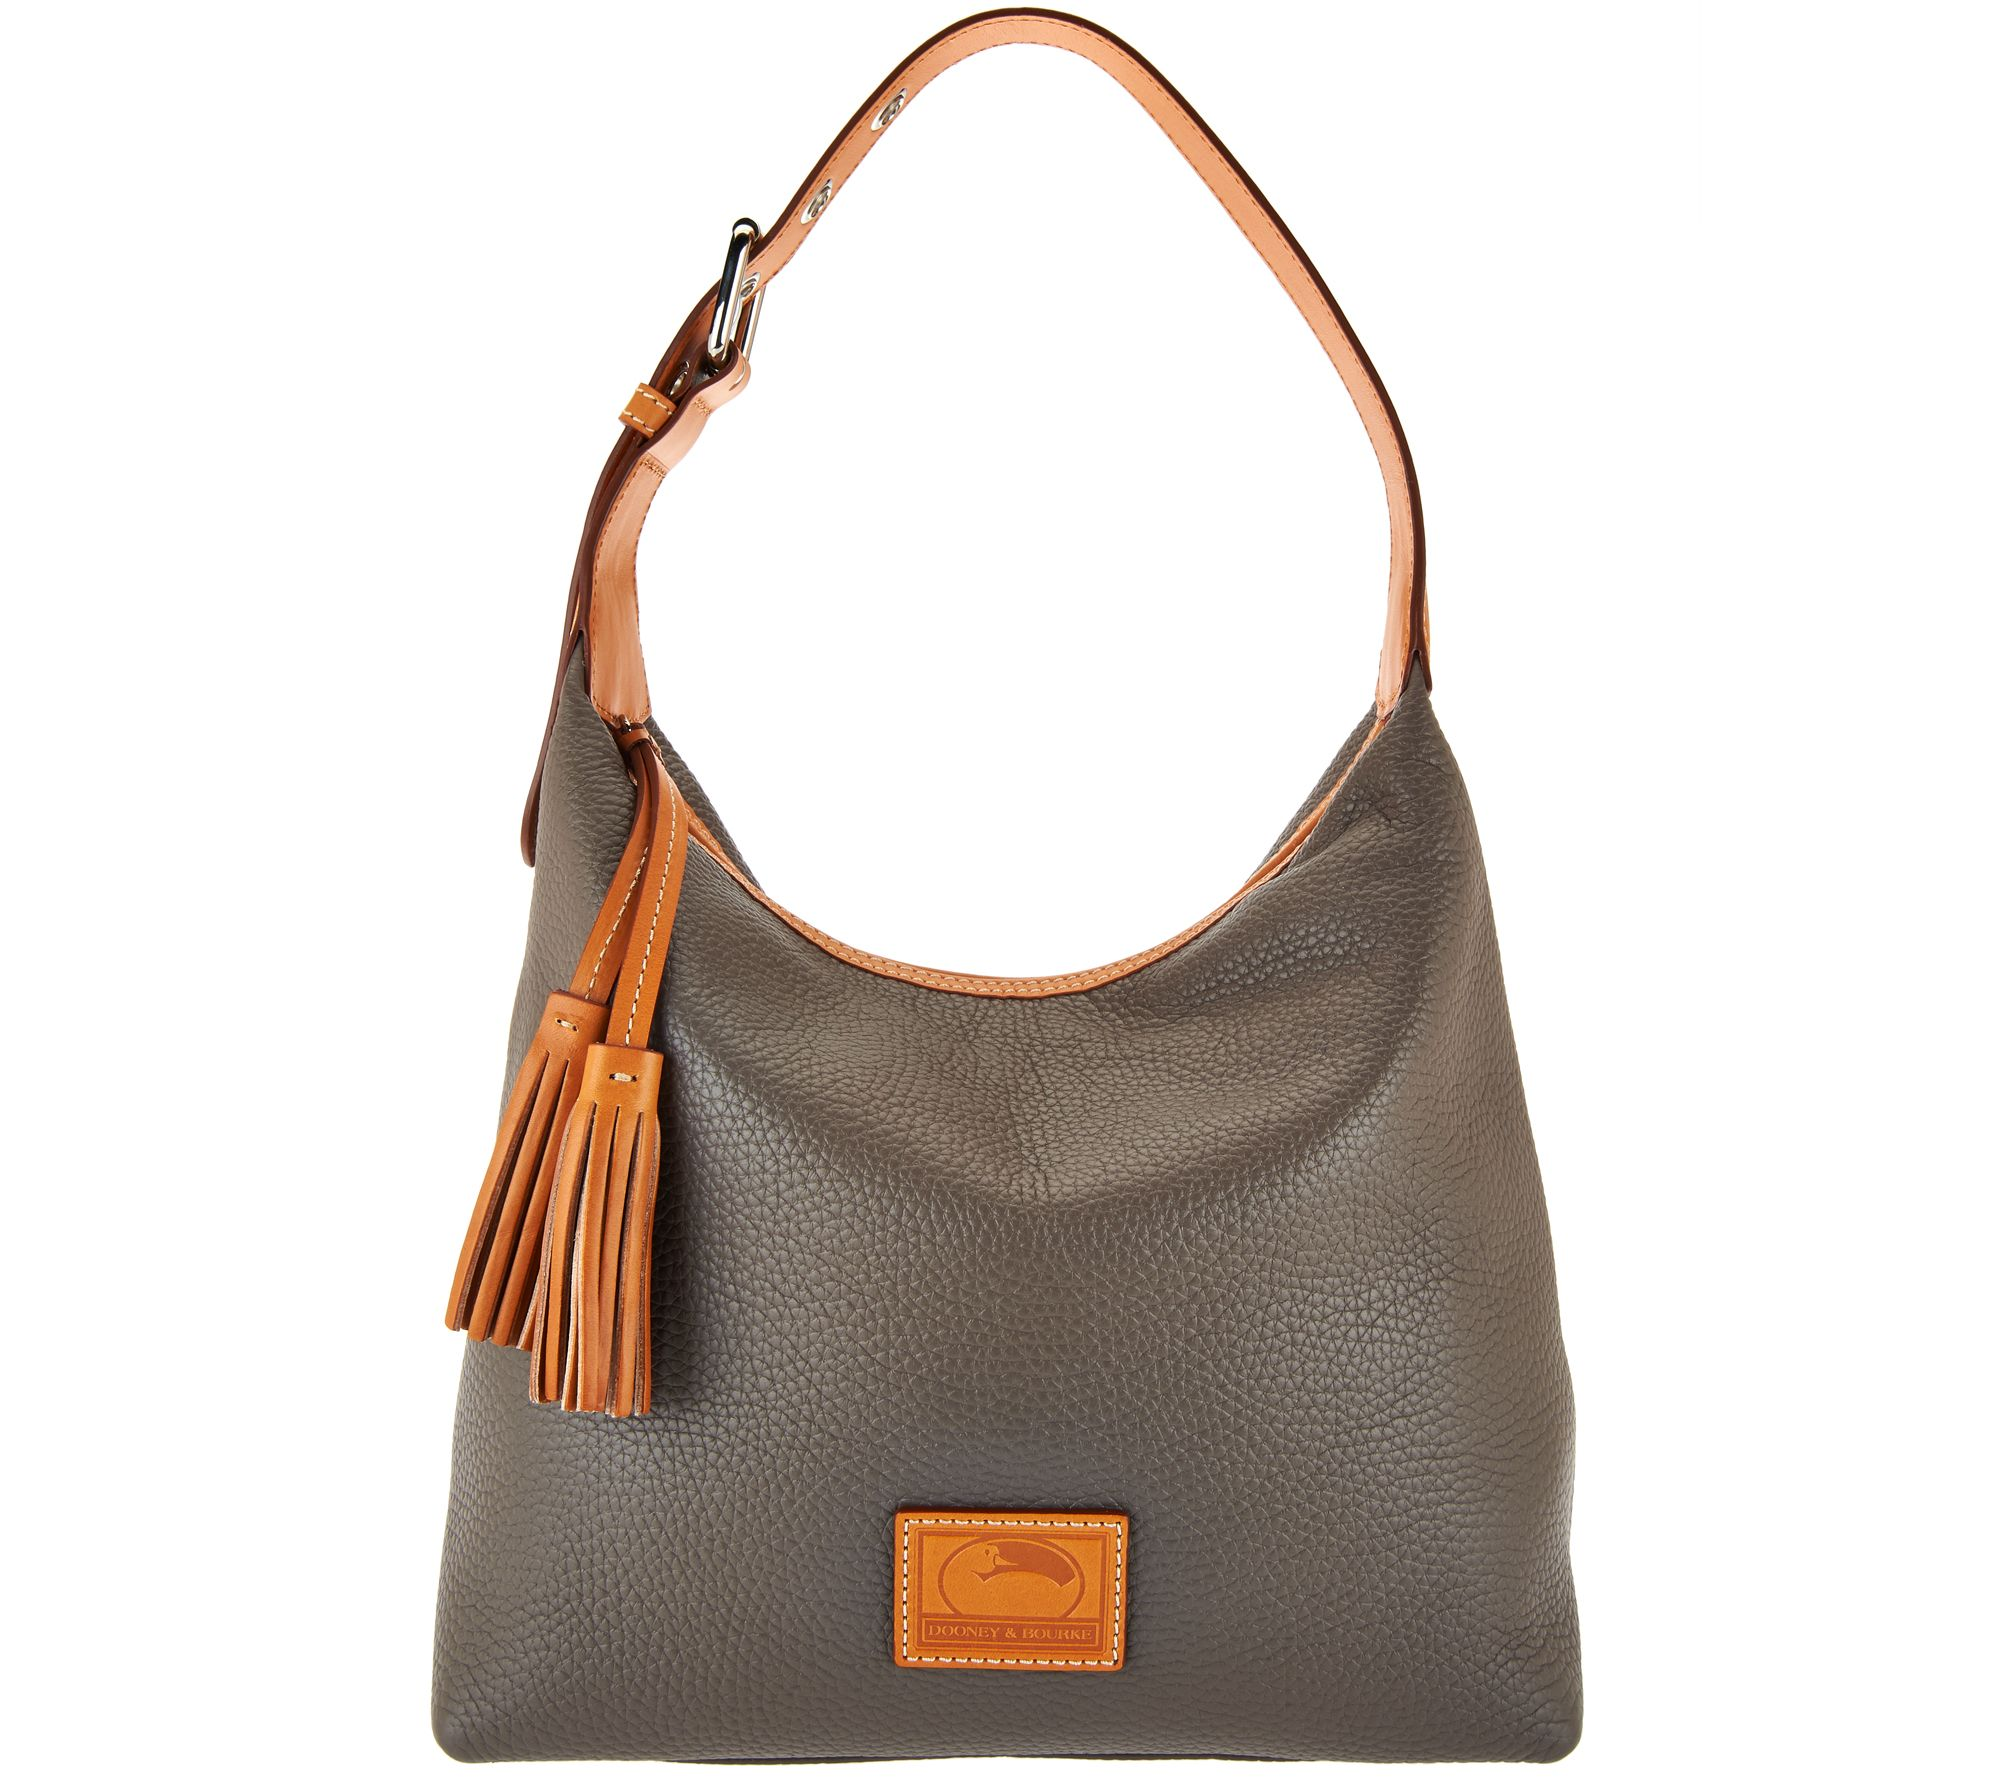 Dooney Bourke Patterson Pebble Leather Hobo Paige A289161